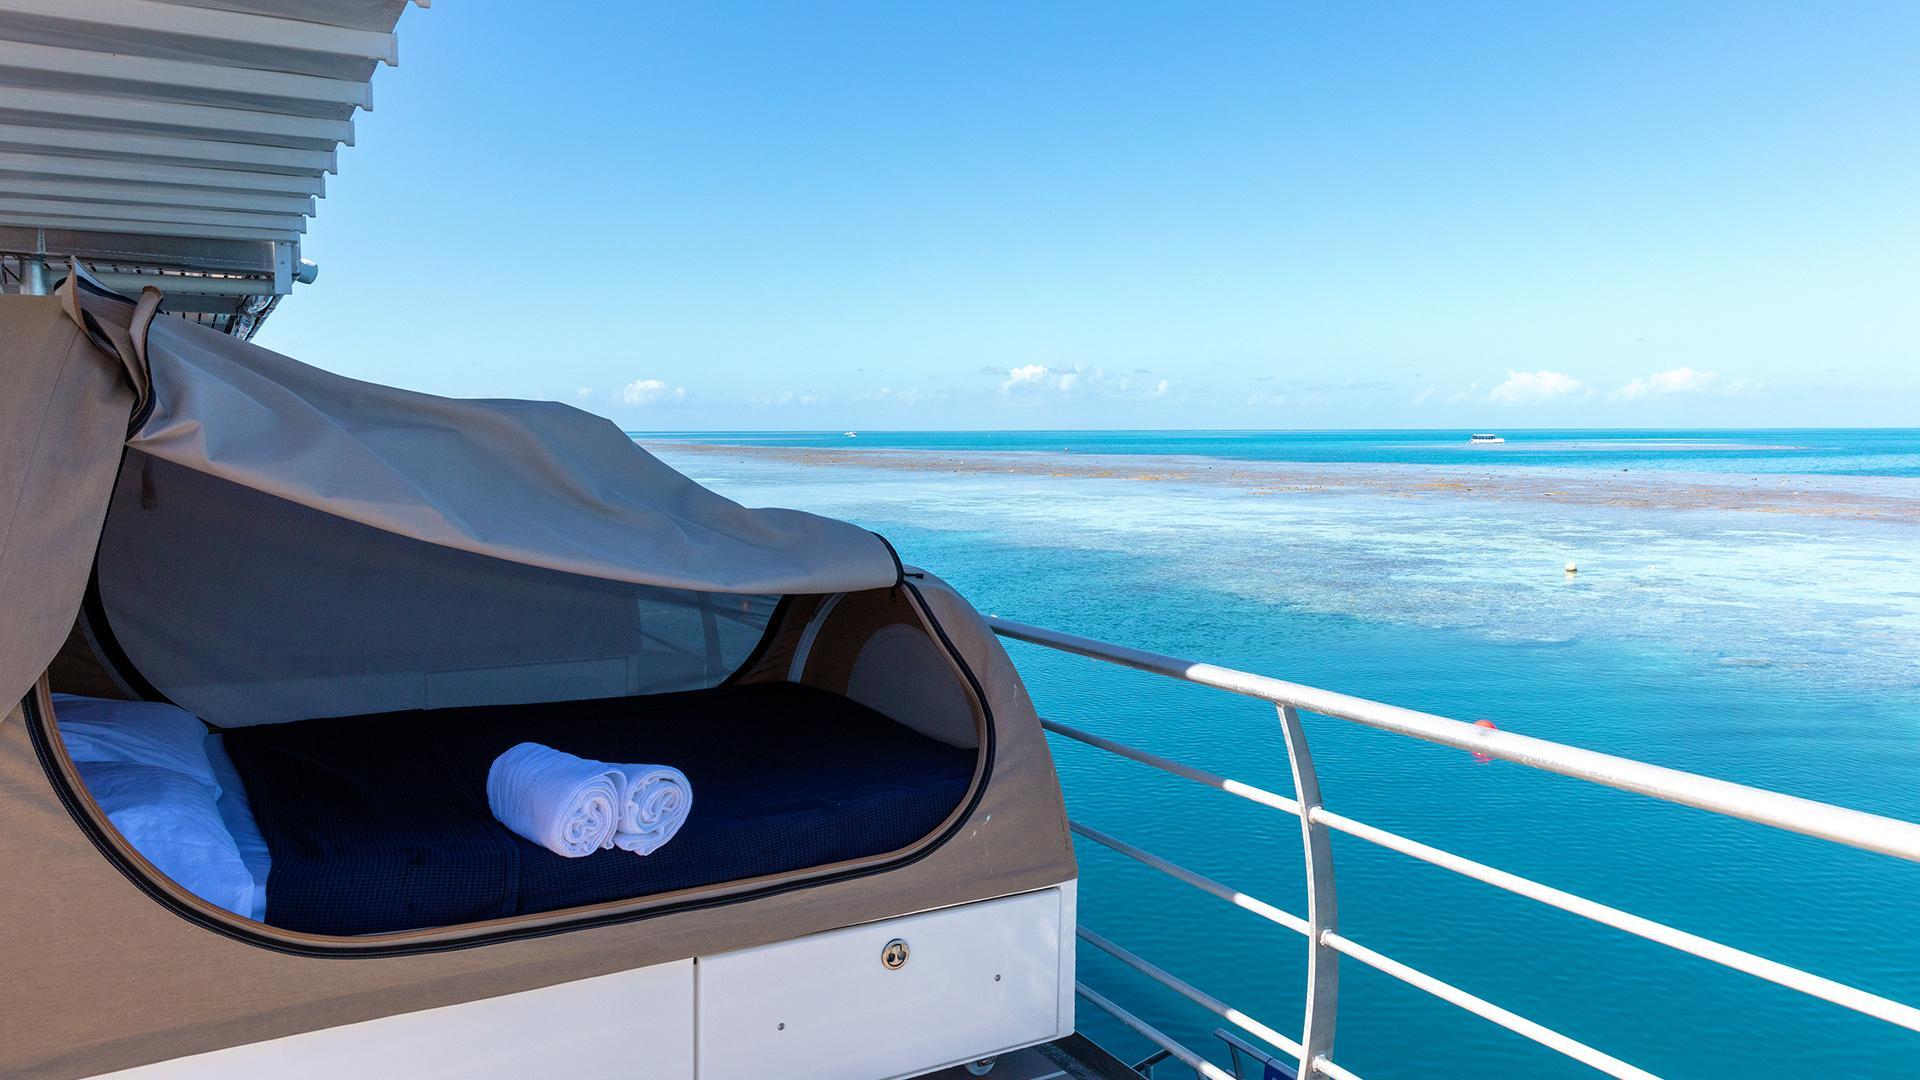 Reefbed (twin share) image 1 at Reefsleep — Cruise Whitsundays by Whitsunday Regional, Queensland, Australia